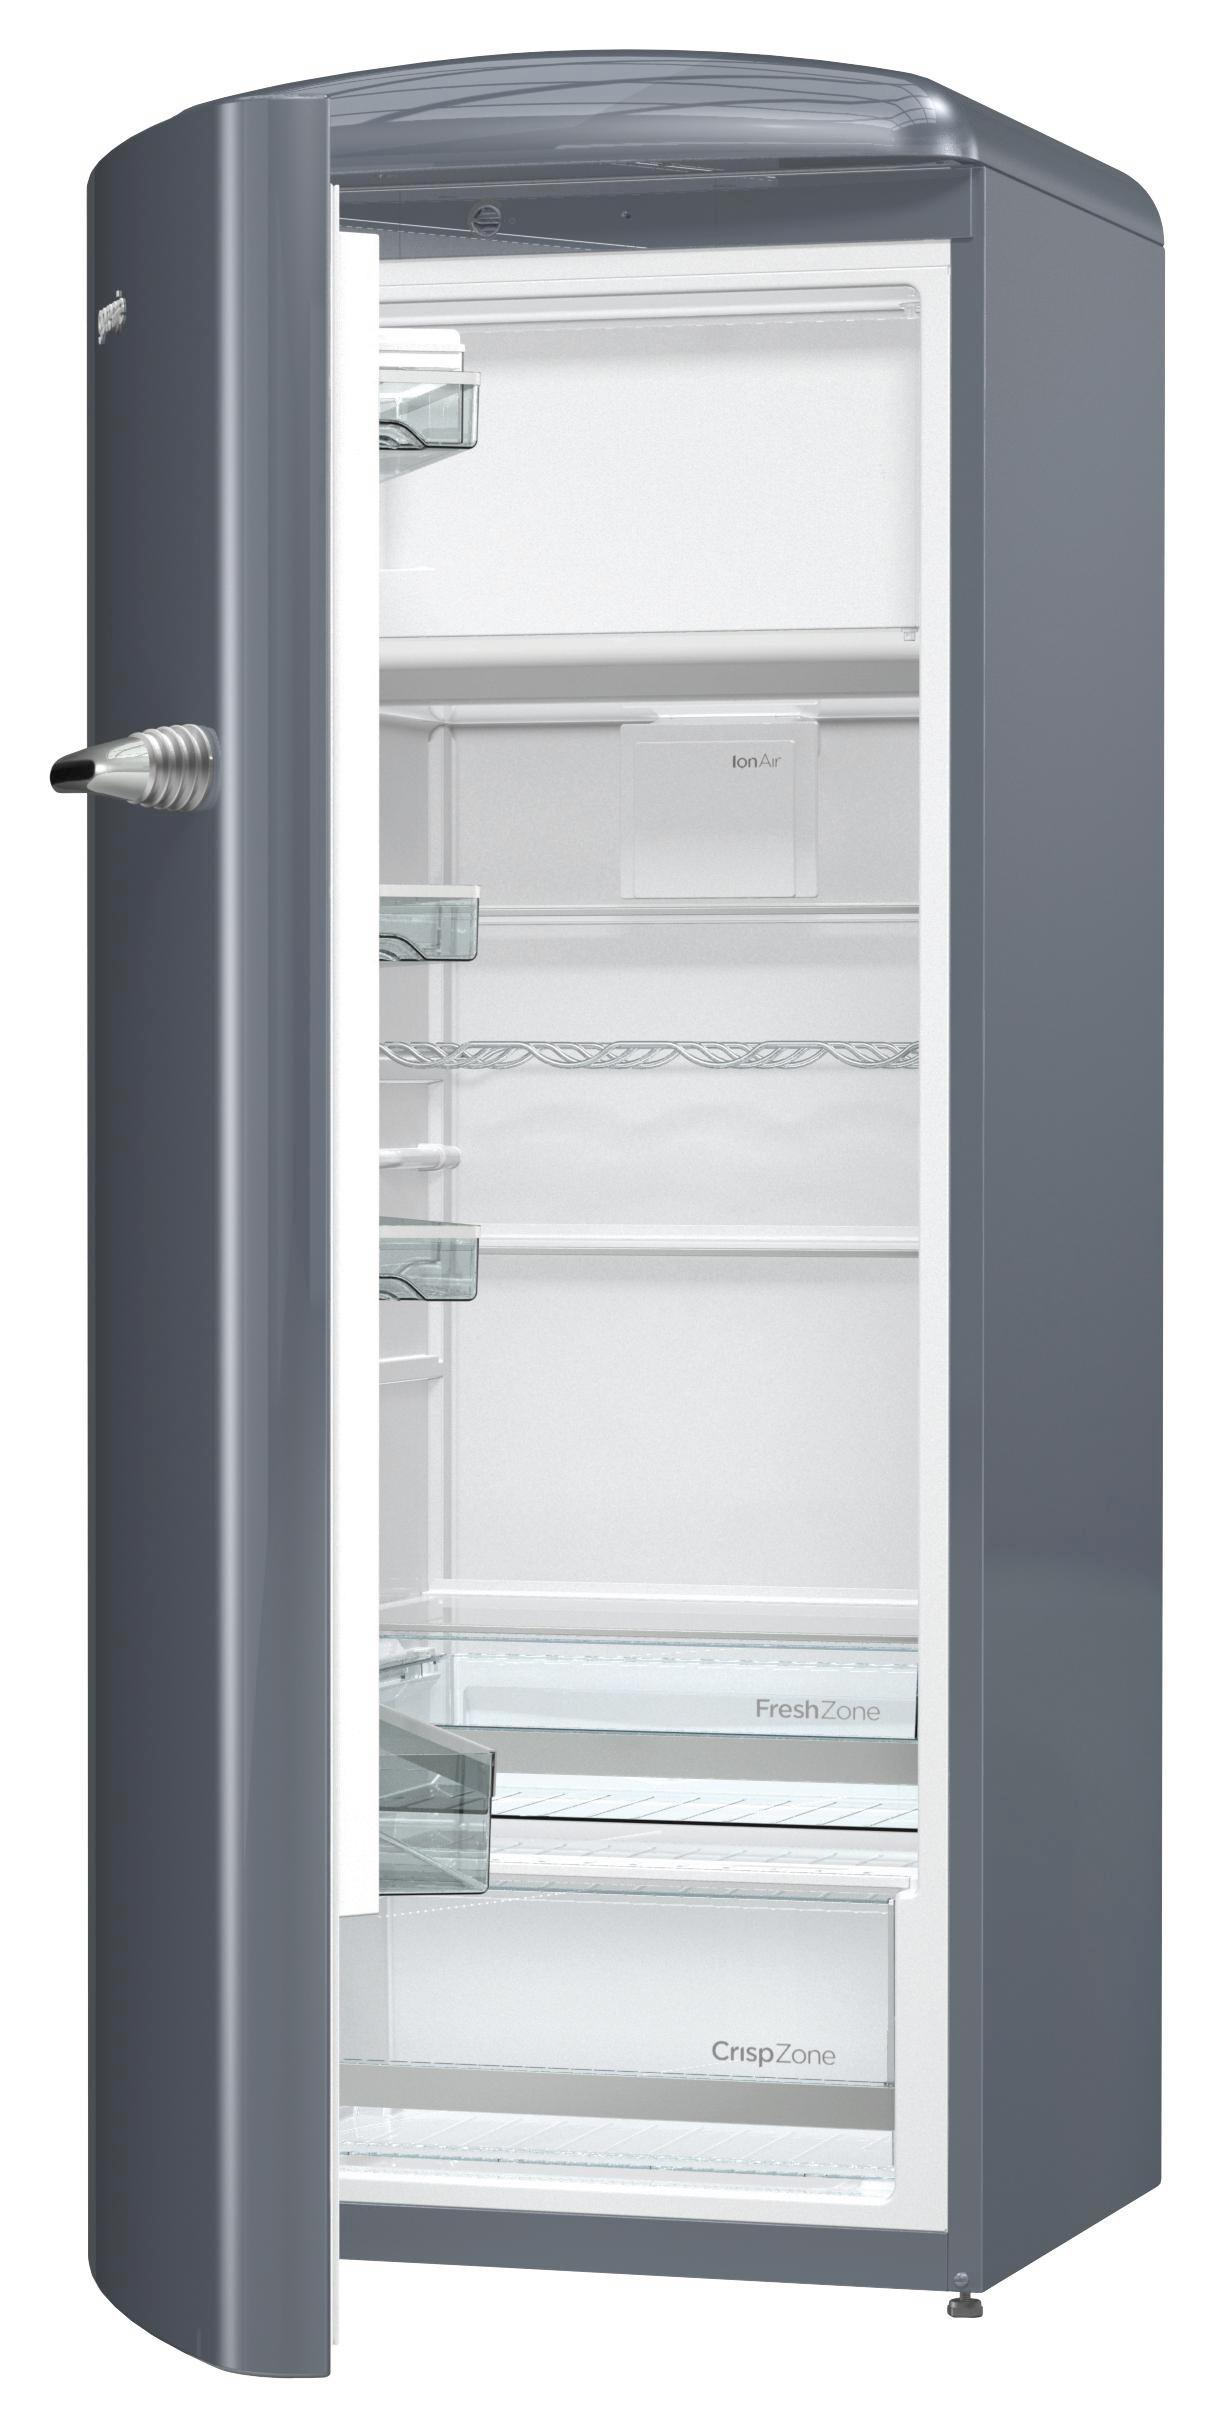 Gorenje Kühlschrank Unterbau Kühlschrank : Gorenje kühlschrank orb l online kaufen ➤ möbelix